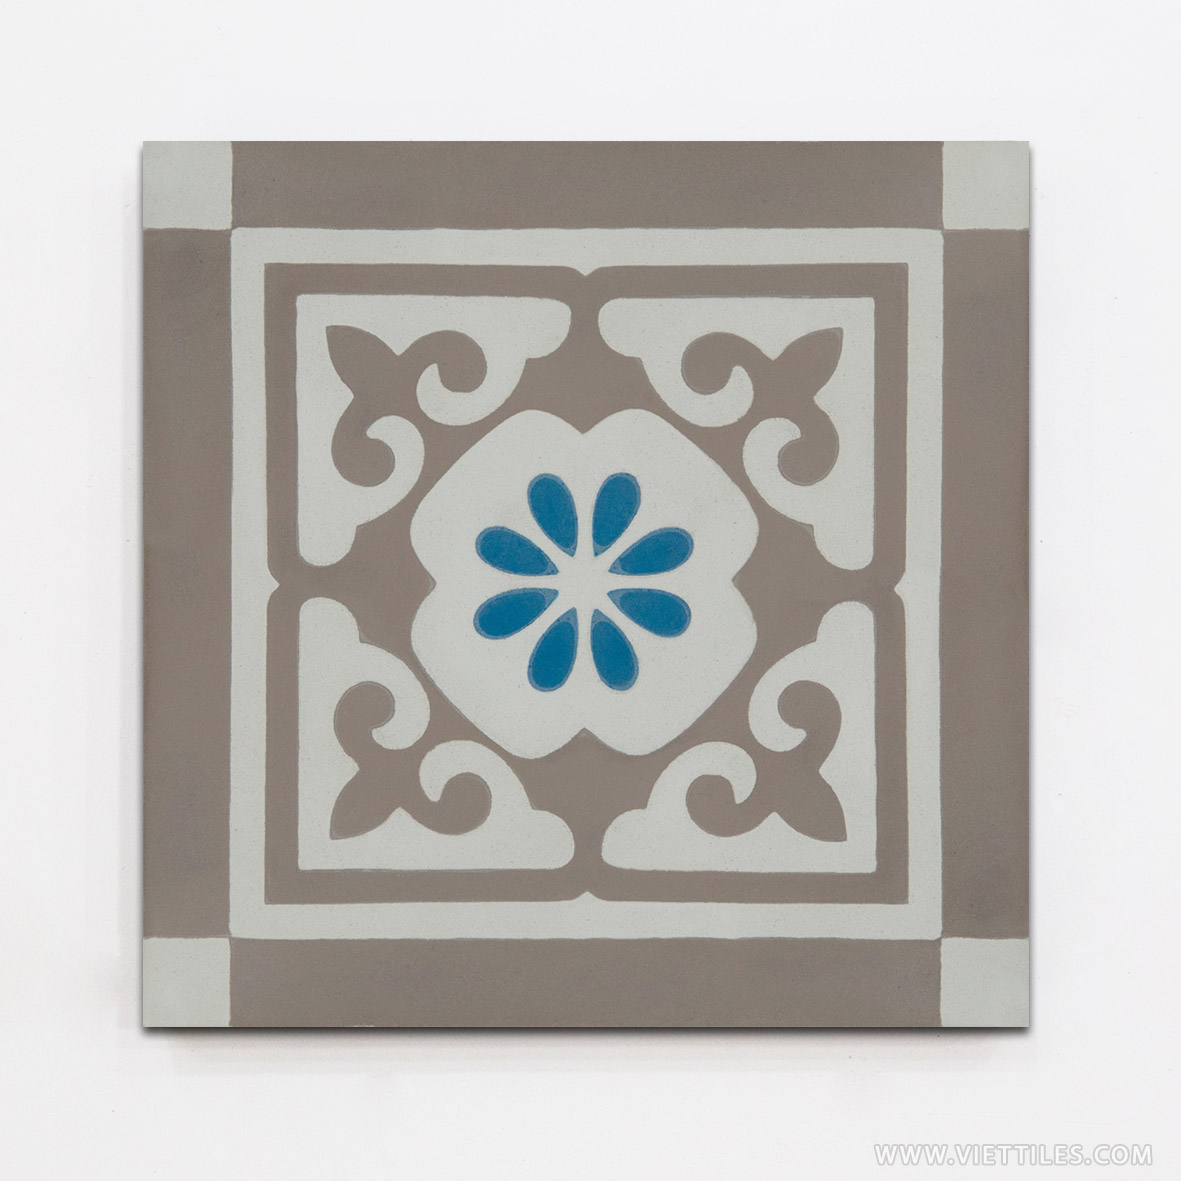 V20-044-T01 Cement Tile